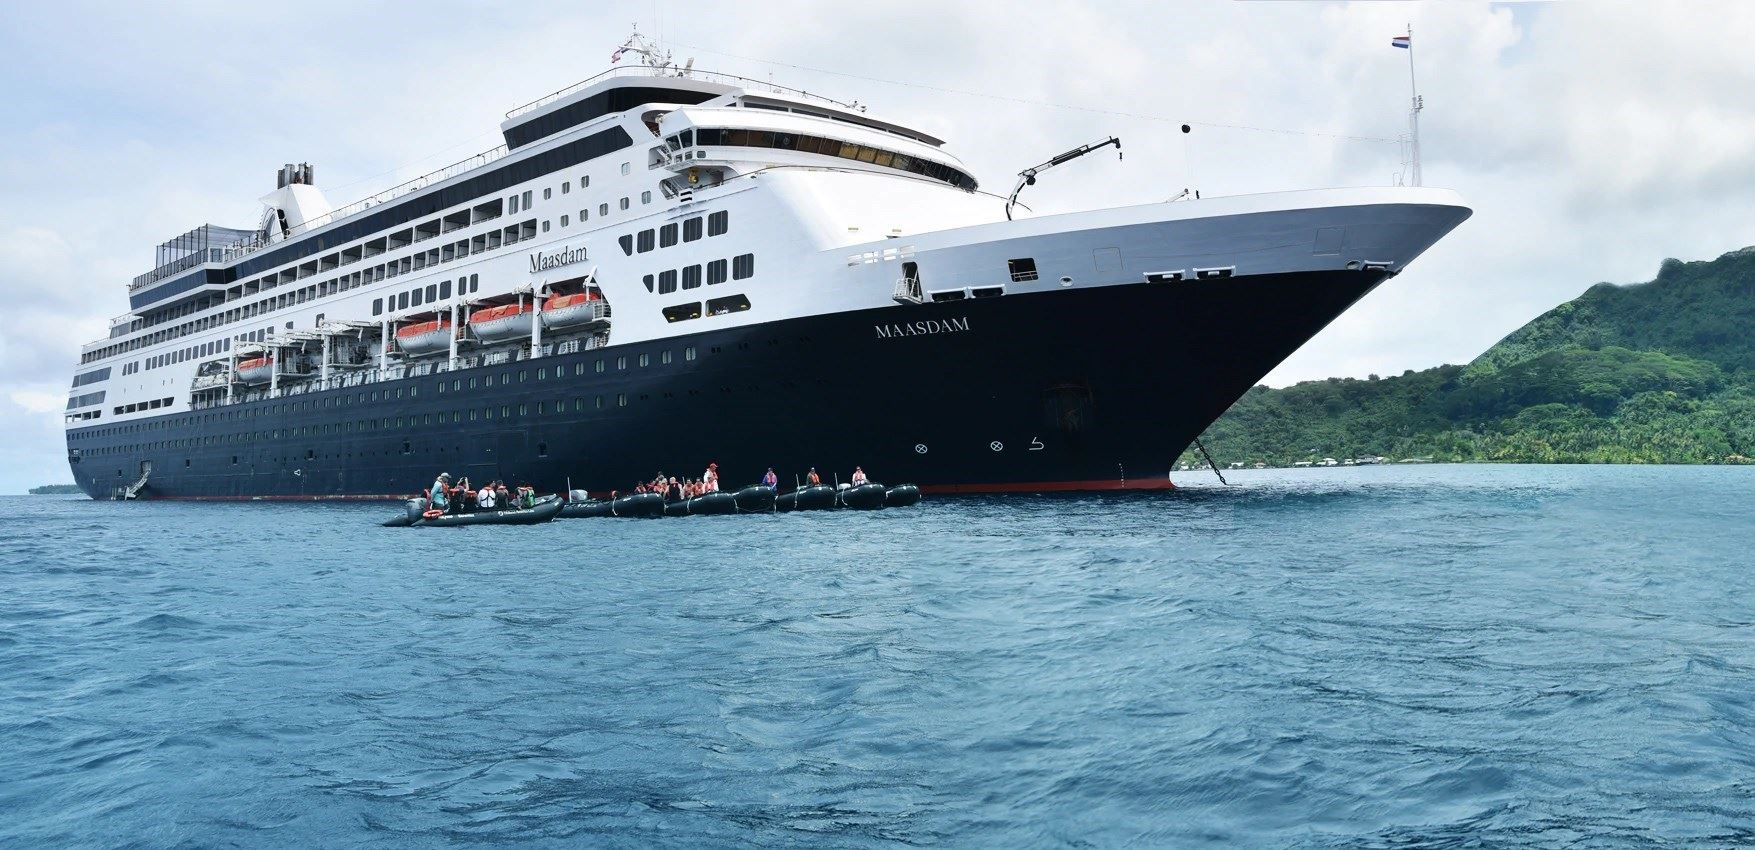 Holland America Line Cruises - 2019 / 2020 / 2021 - Cruise Deals